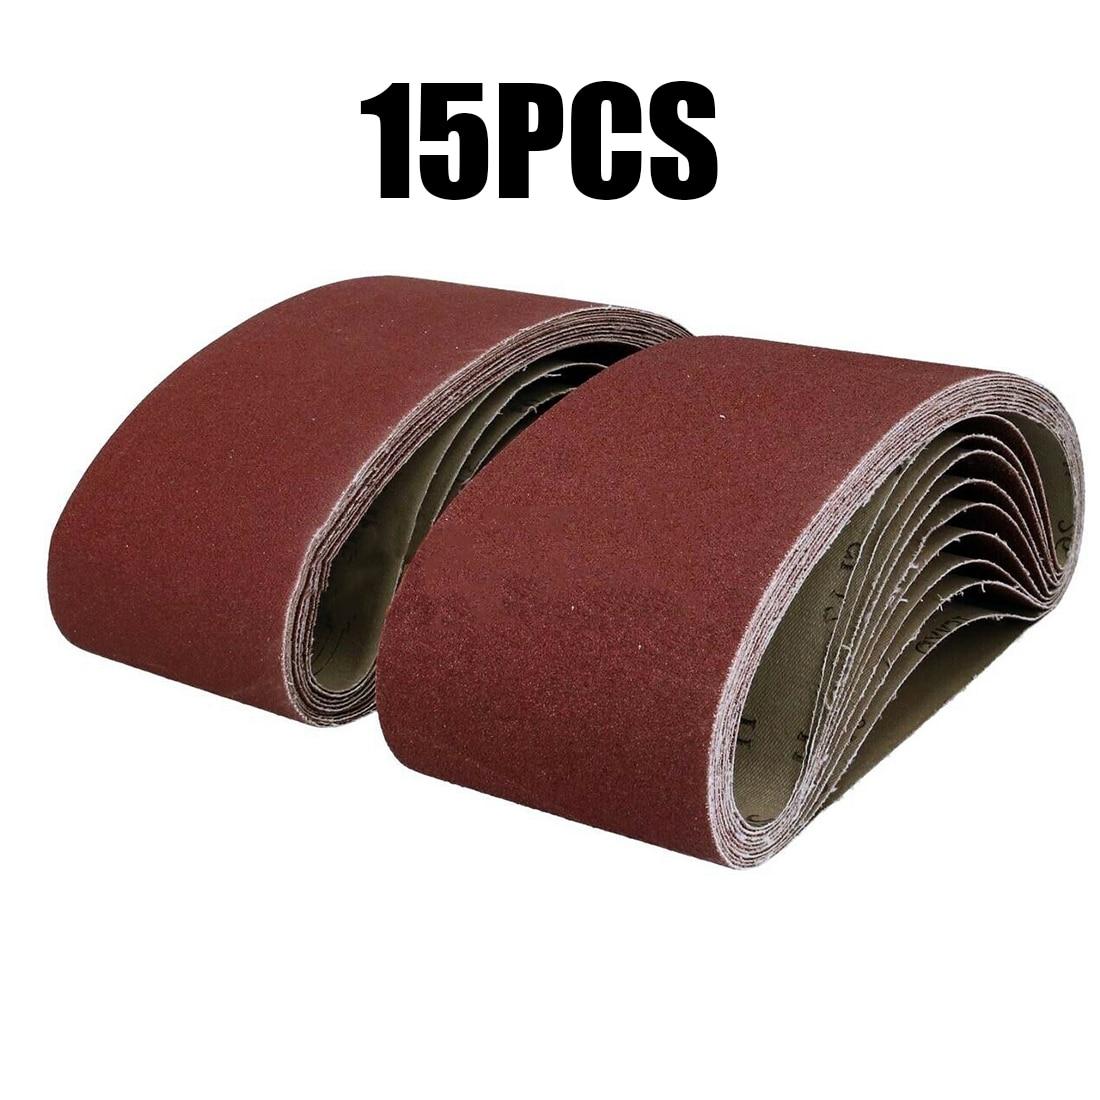 15Pcs Poshing Tool Sanding Belt For Wood Varnish Gypsum Plastic 40/80/120Grid For Wood, Varnish, Paint, Plastic, Gypsum New